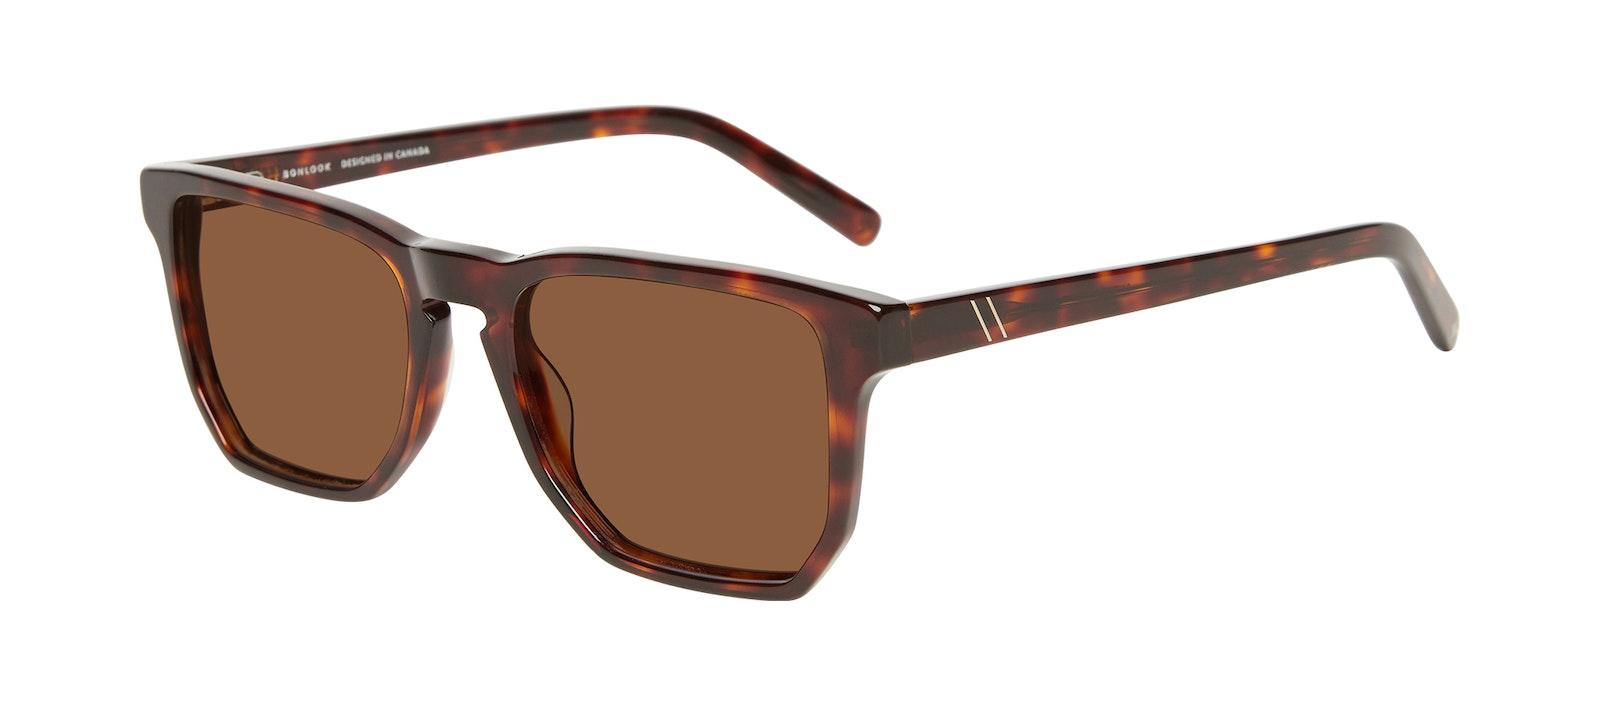 Affordable Fashion Glasses Square Sunglasses Men Andy Tortoise Tilt